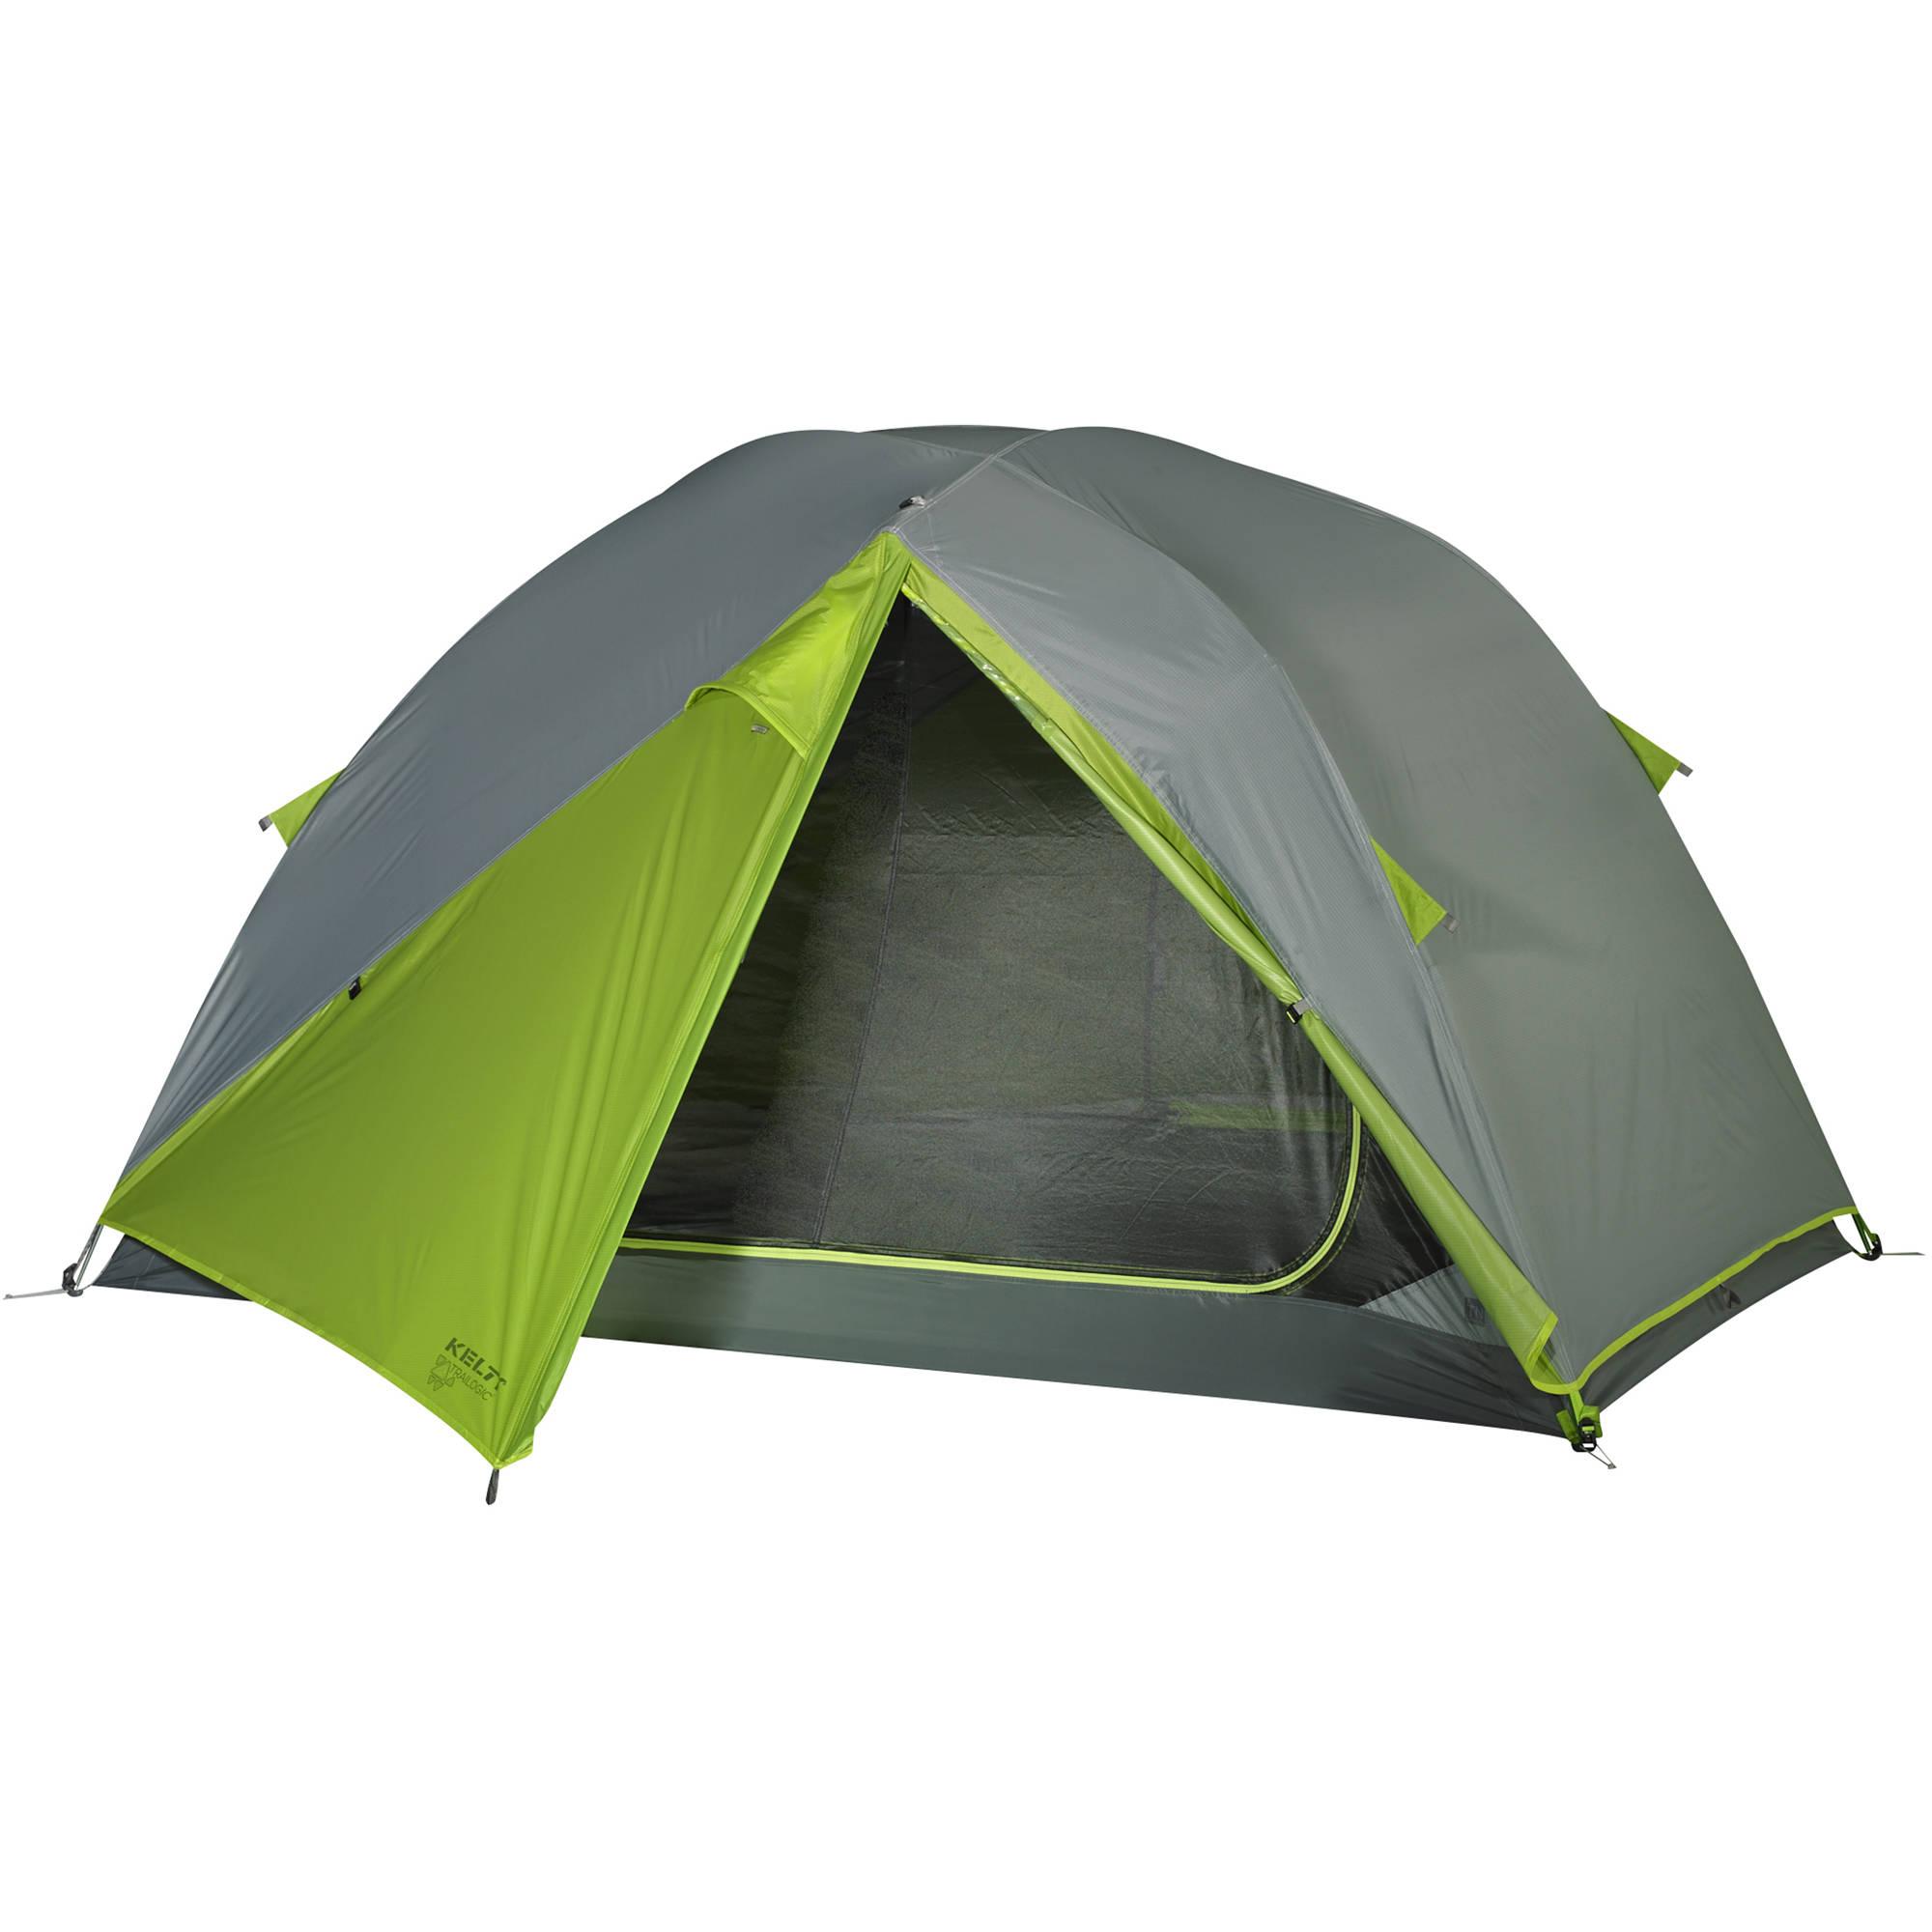 Kelty TN2 Tent (2-Person)  sc 1 st  Bu0026H & Kelty TN2 Tent (2-Person) 40815414 Bu0026H Photo Video